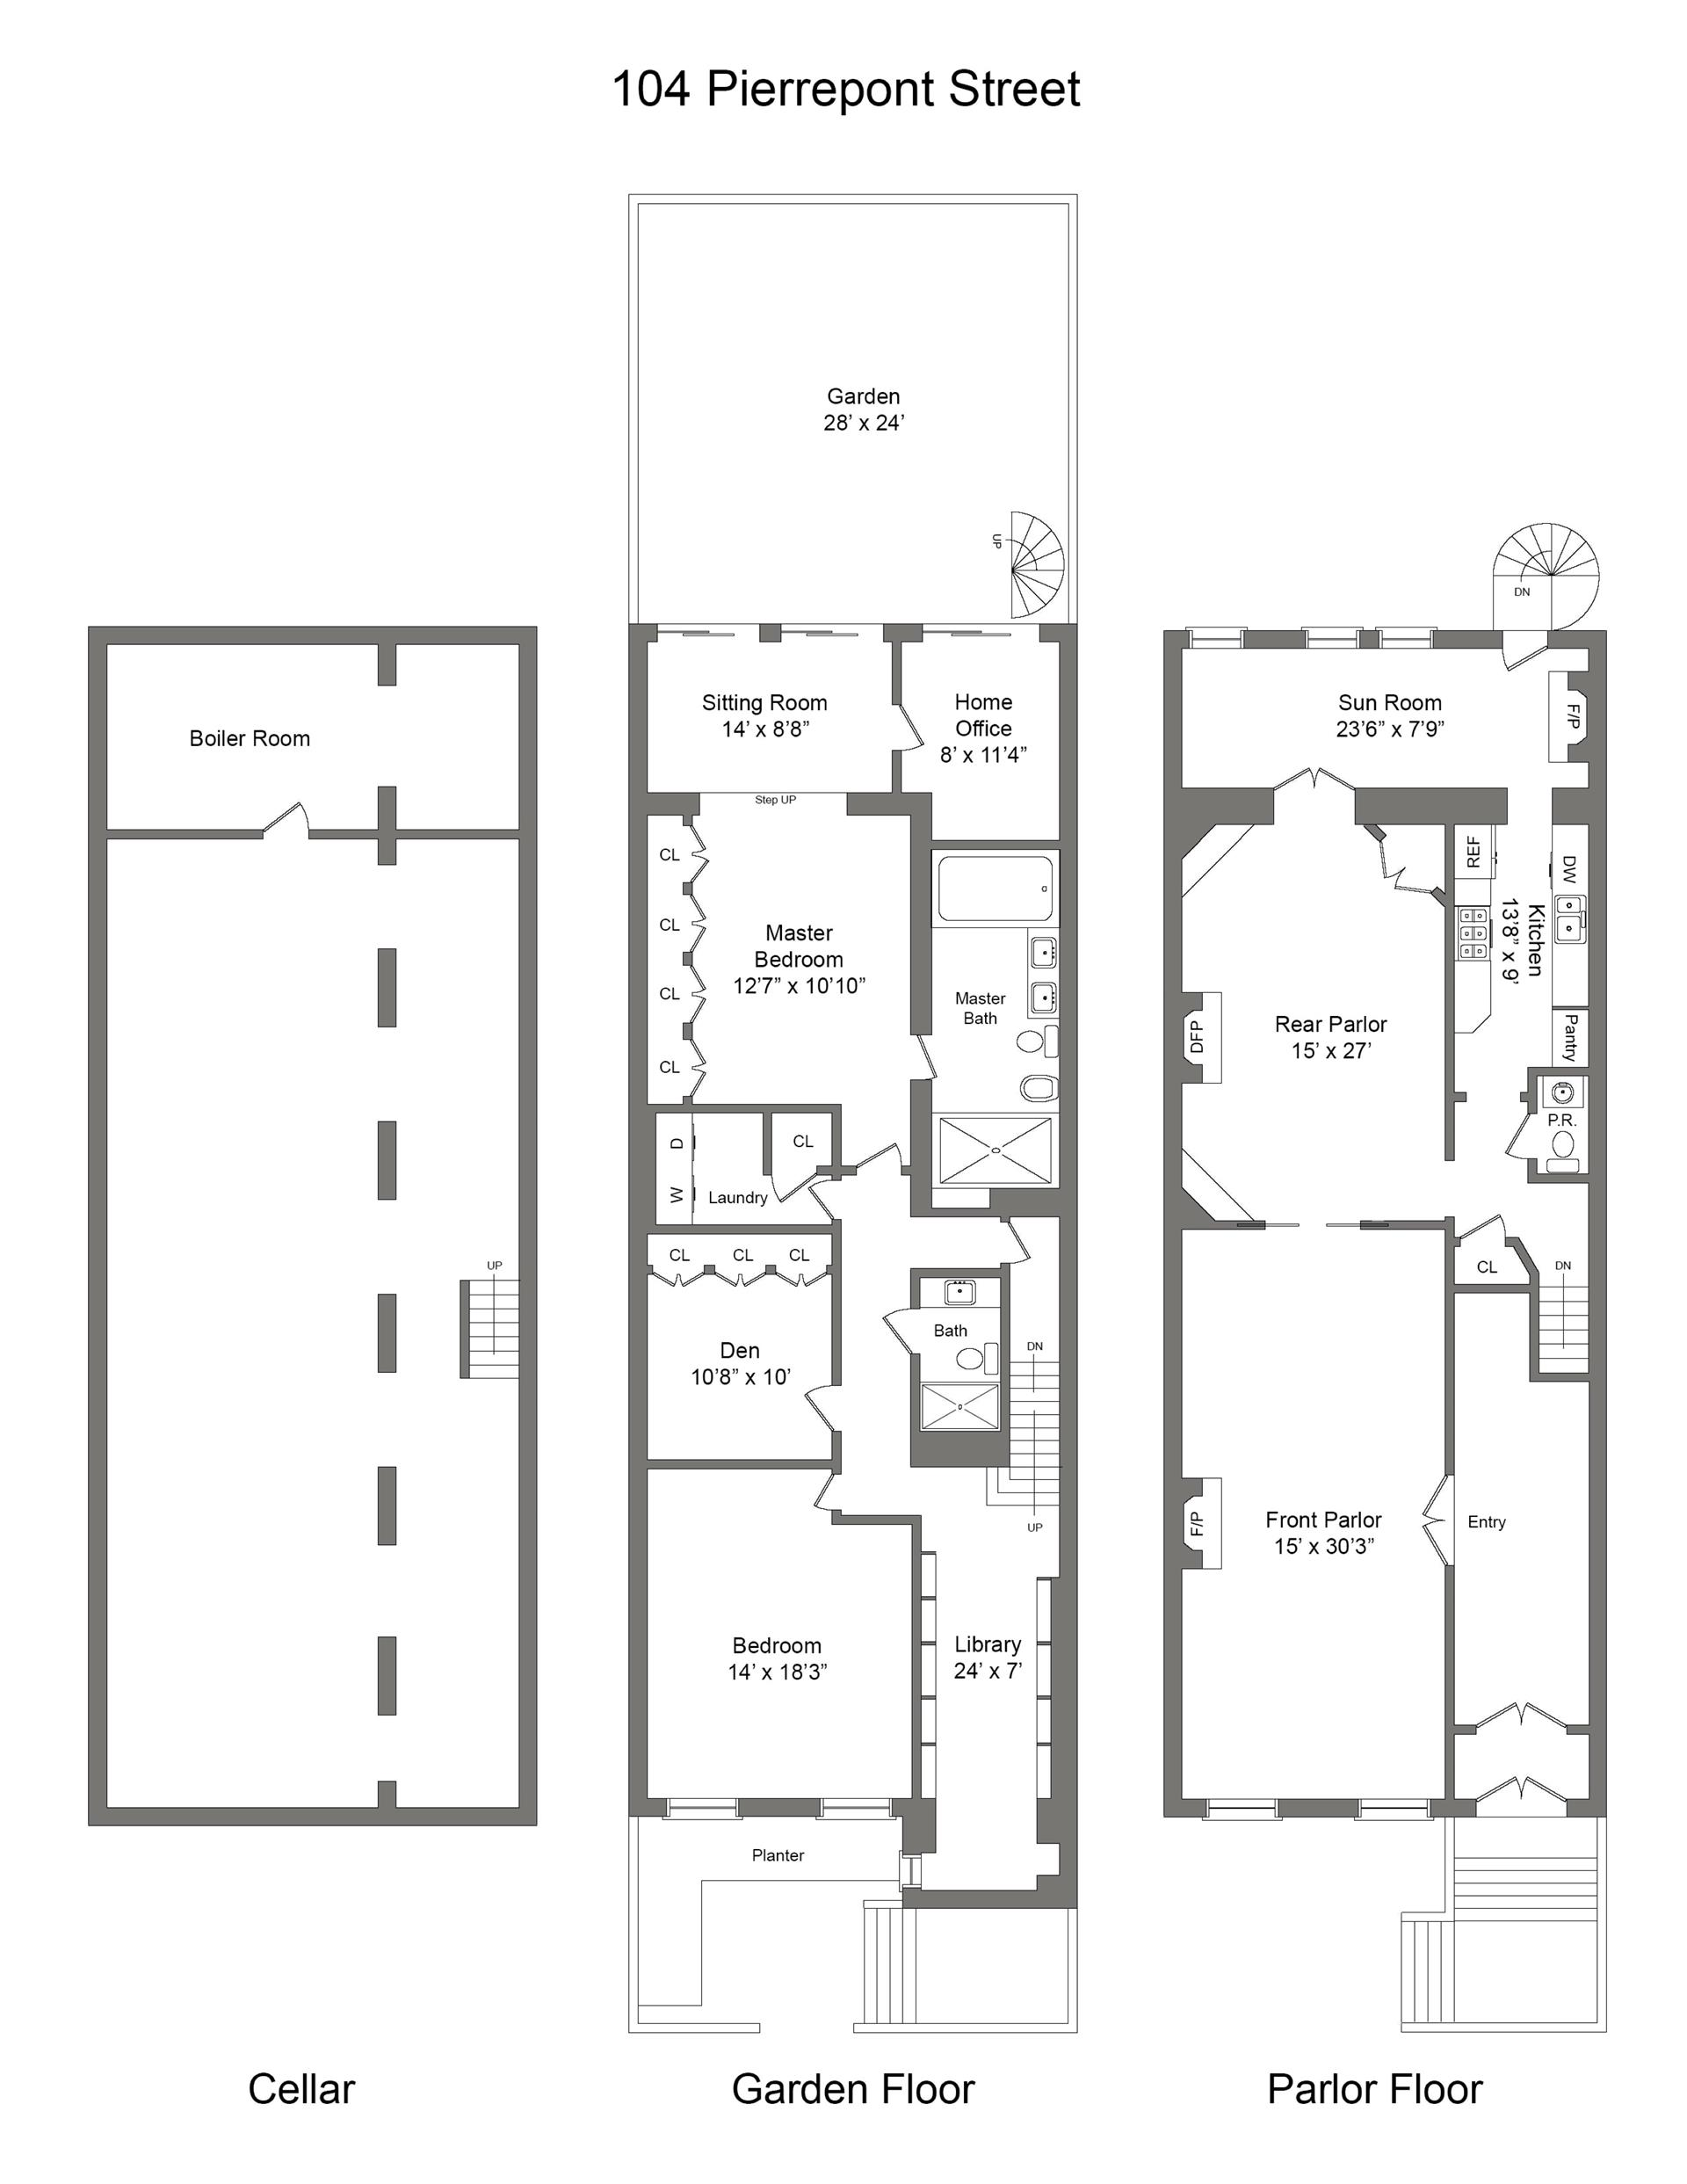 Floor plan of 104 Pierrepont St, 1 - Brooklyn Heights, New York